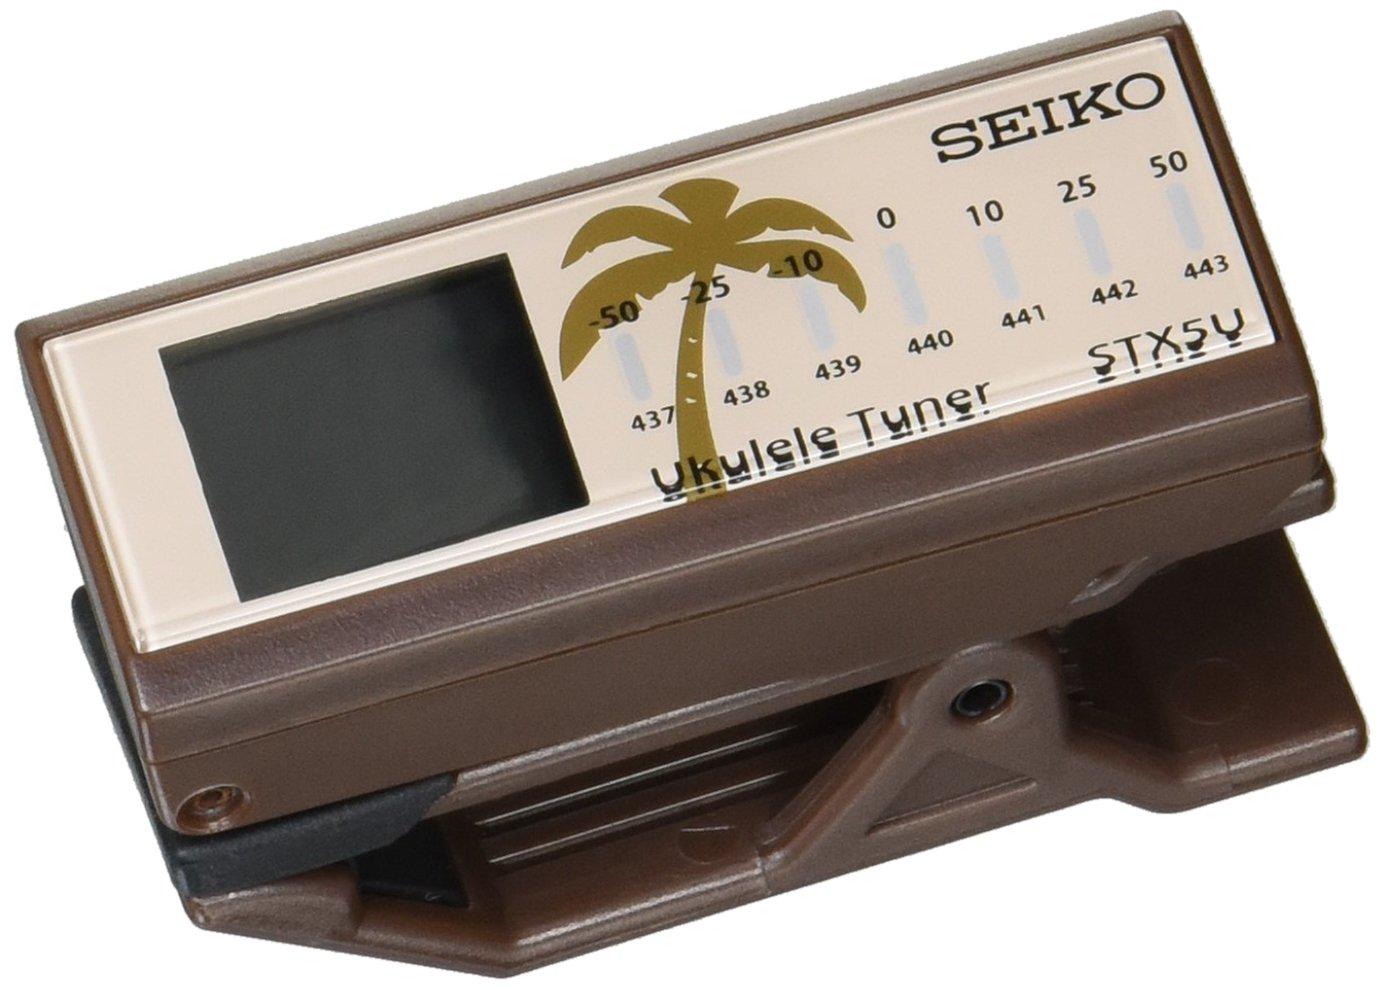 Seiko stx5u C Ukulele Tuner speciale (Japan Import) STX5UC